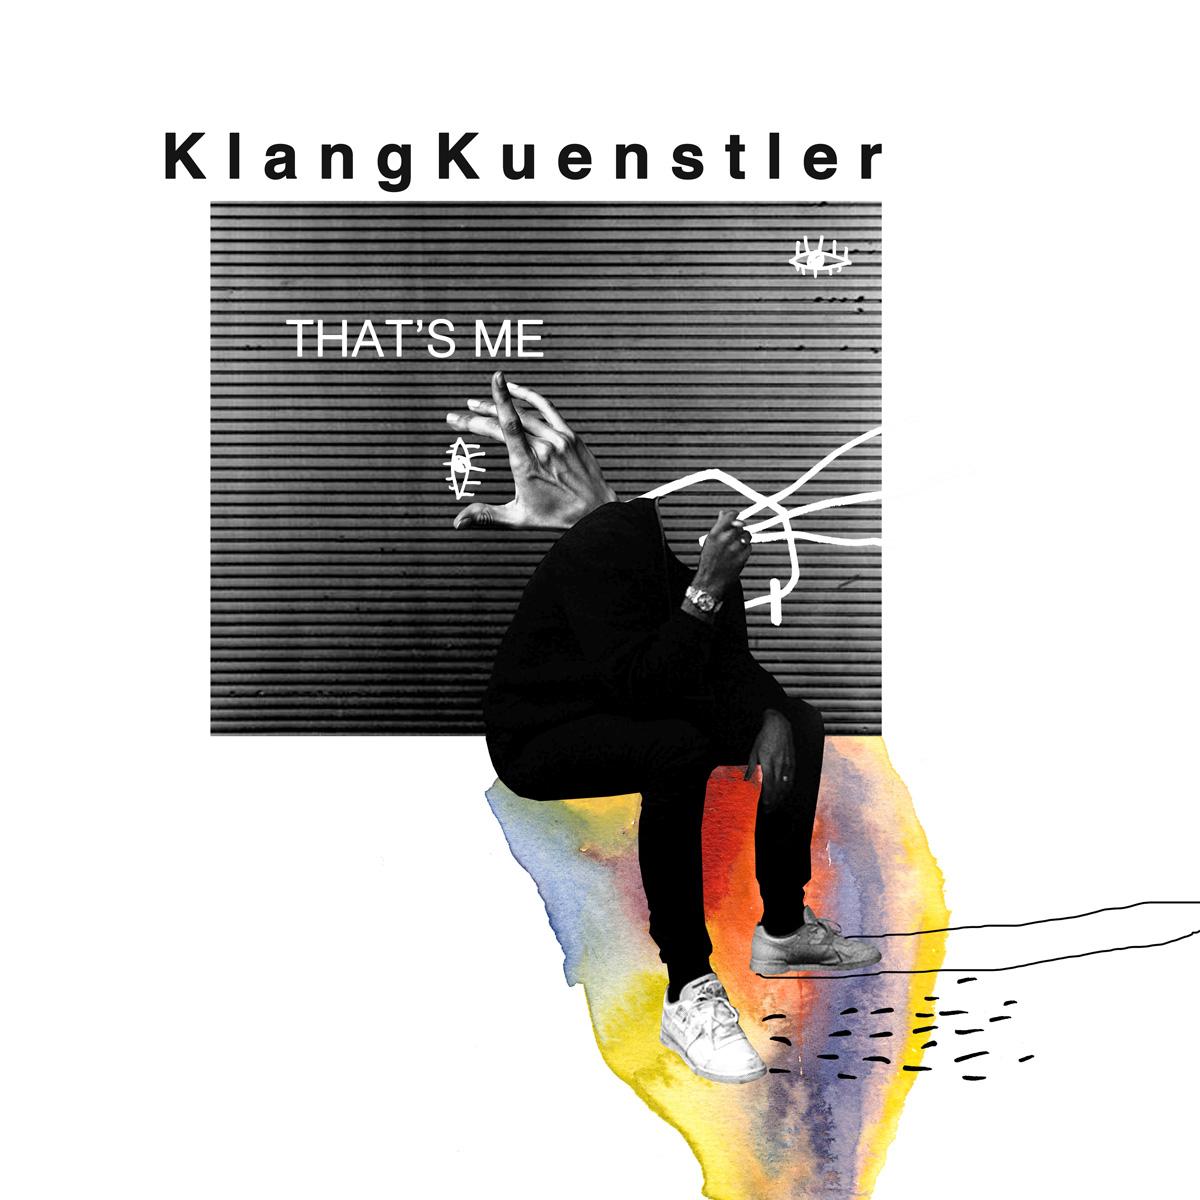 KlangKuenstler – That's Me (Play Elegent)